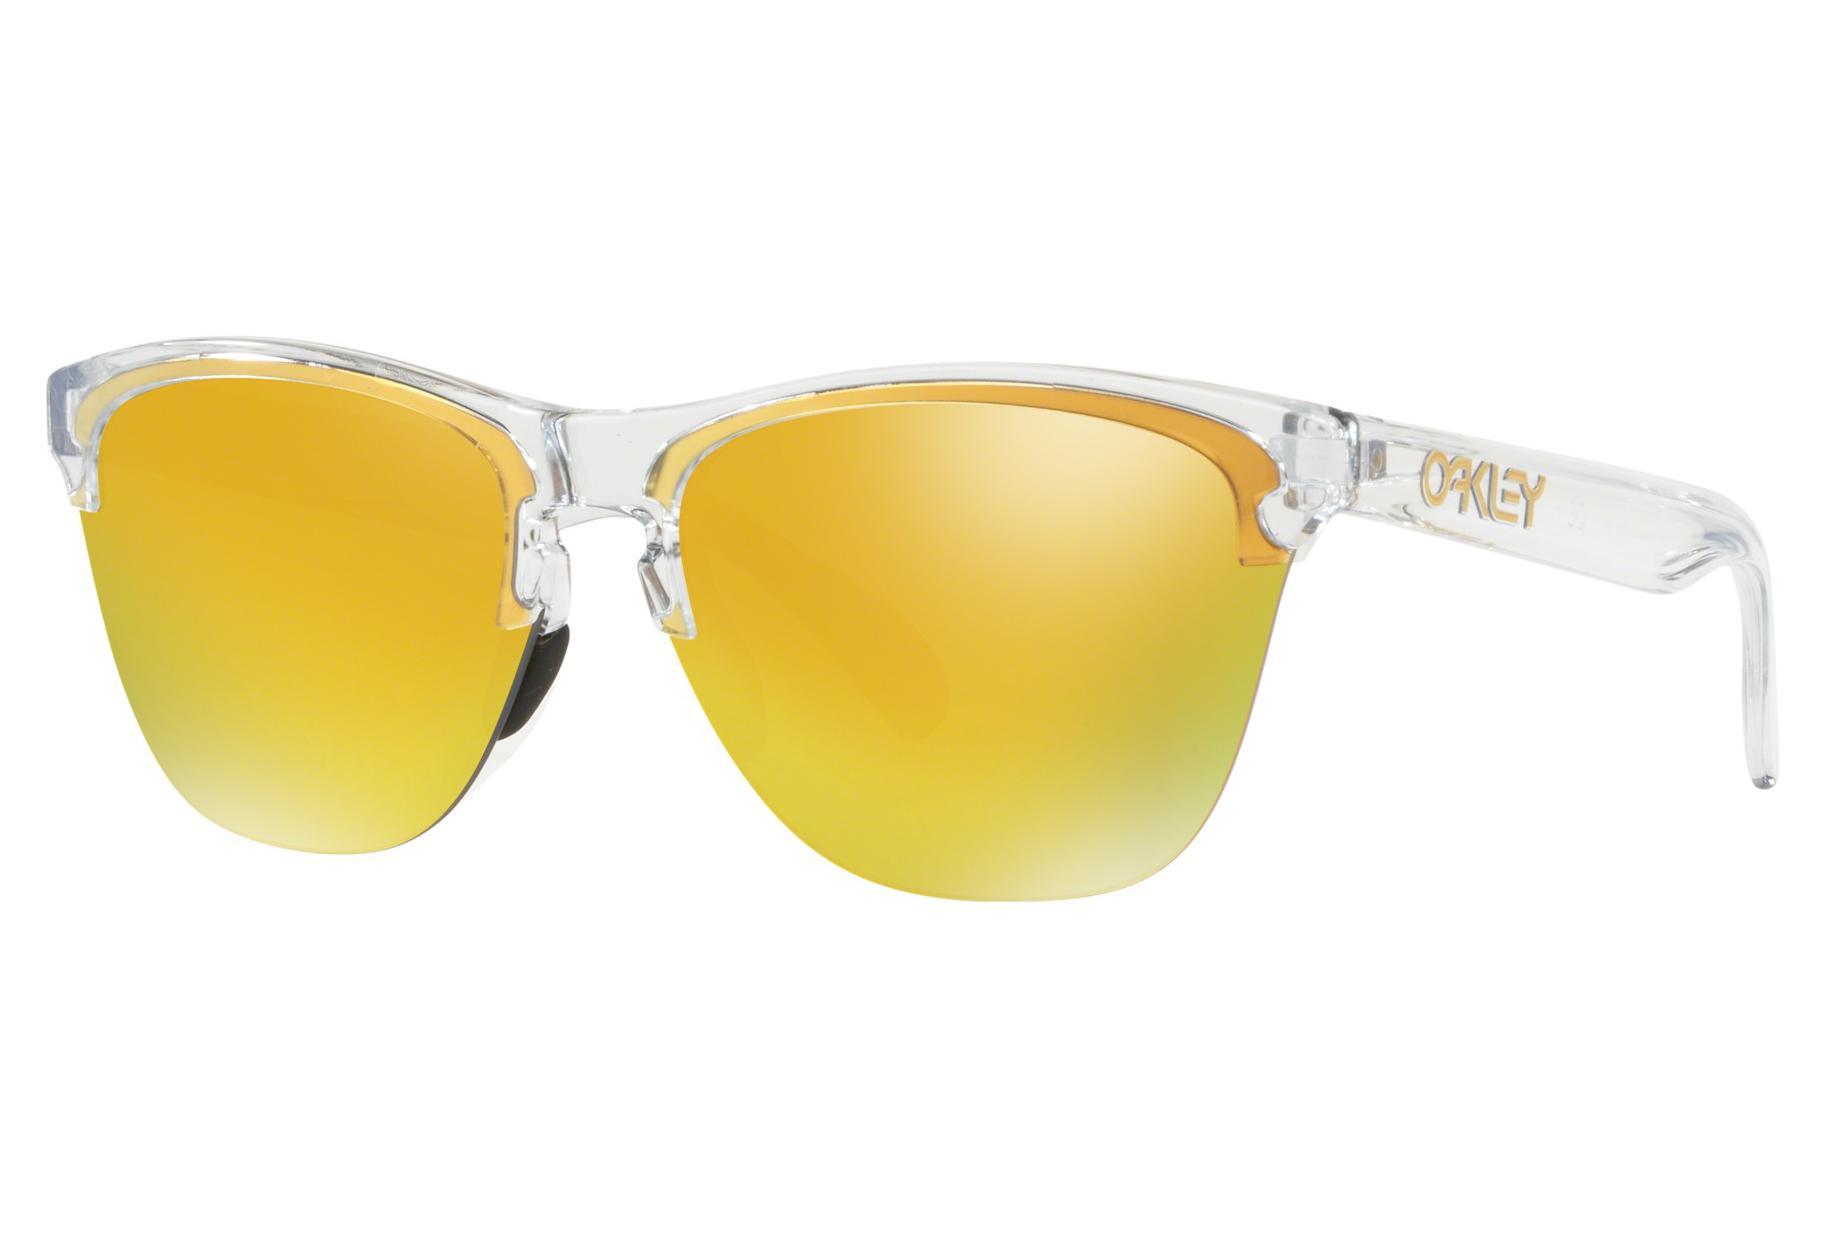 6d3d85842e Oakley Frogskins Lite Sunglasses Polished Clear   24K Iridium   Ref.  OO9374-1363